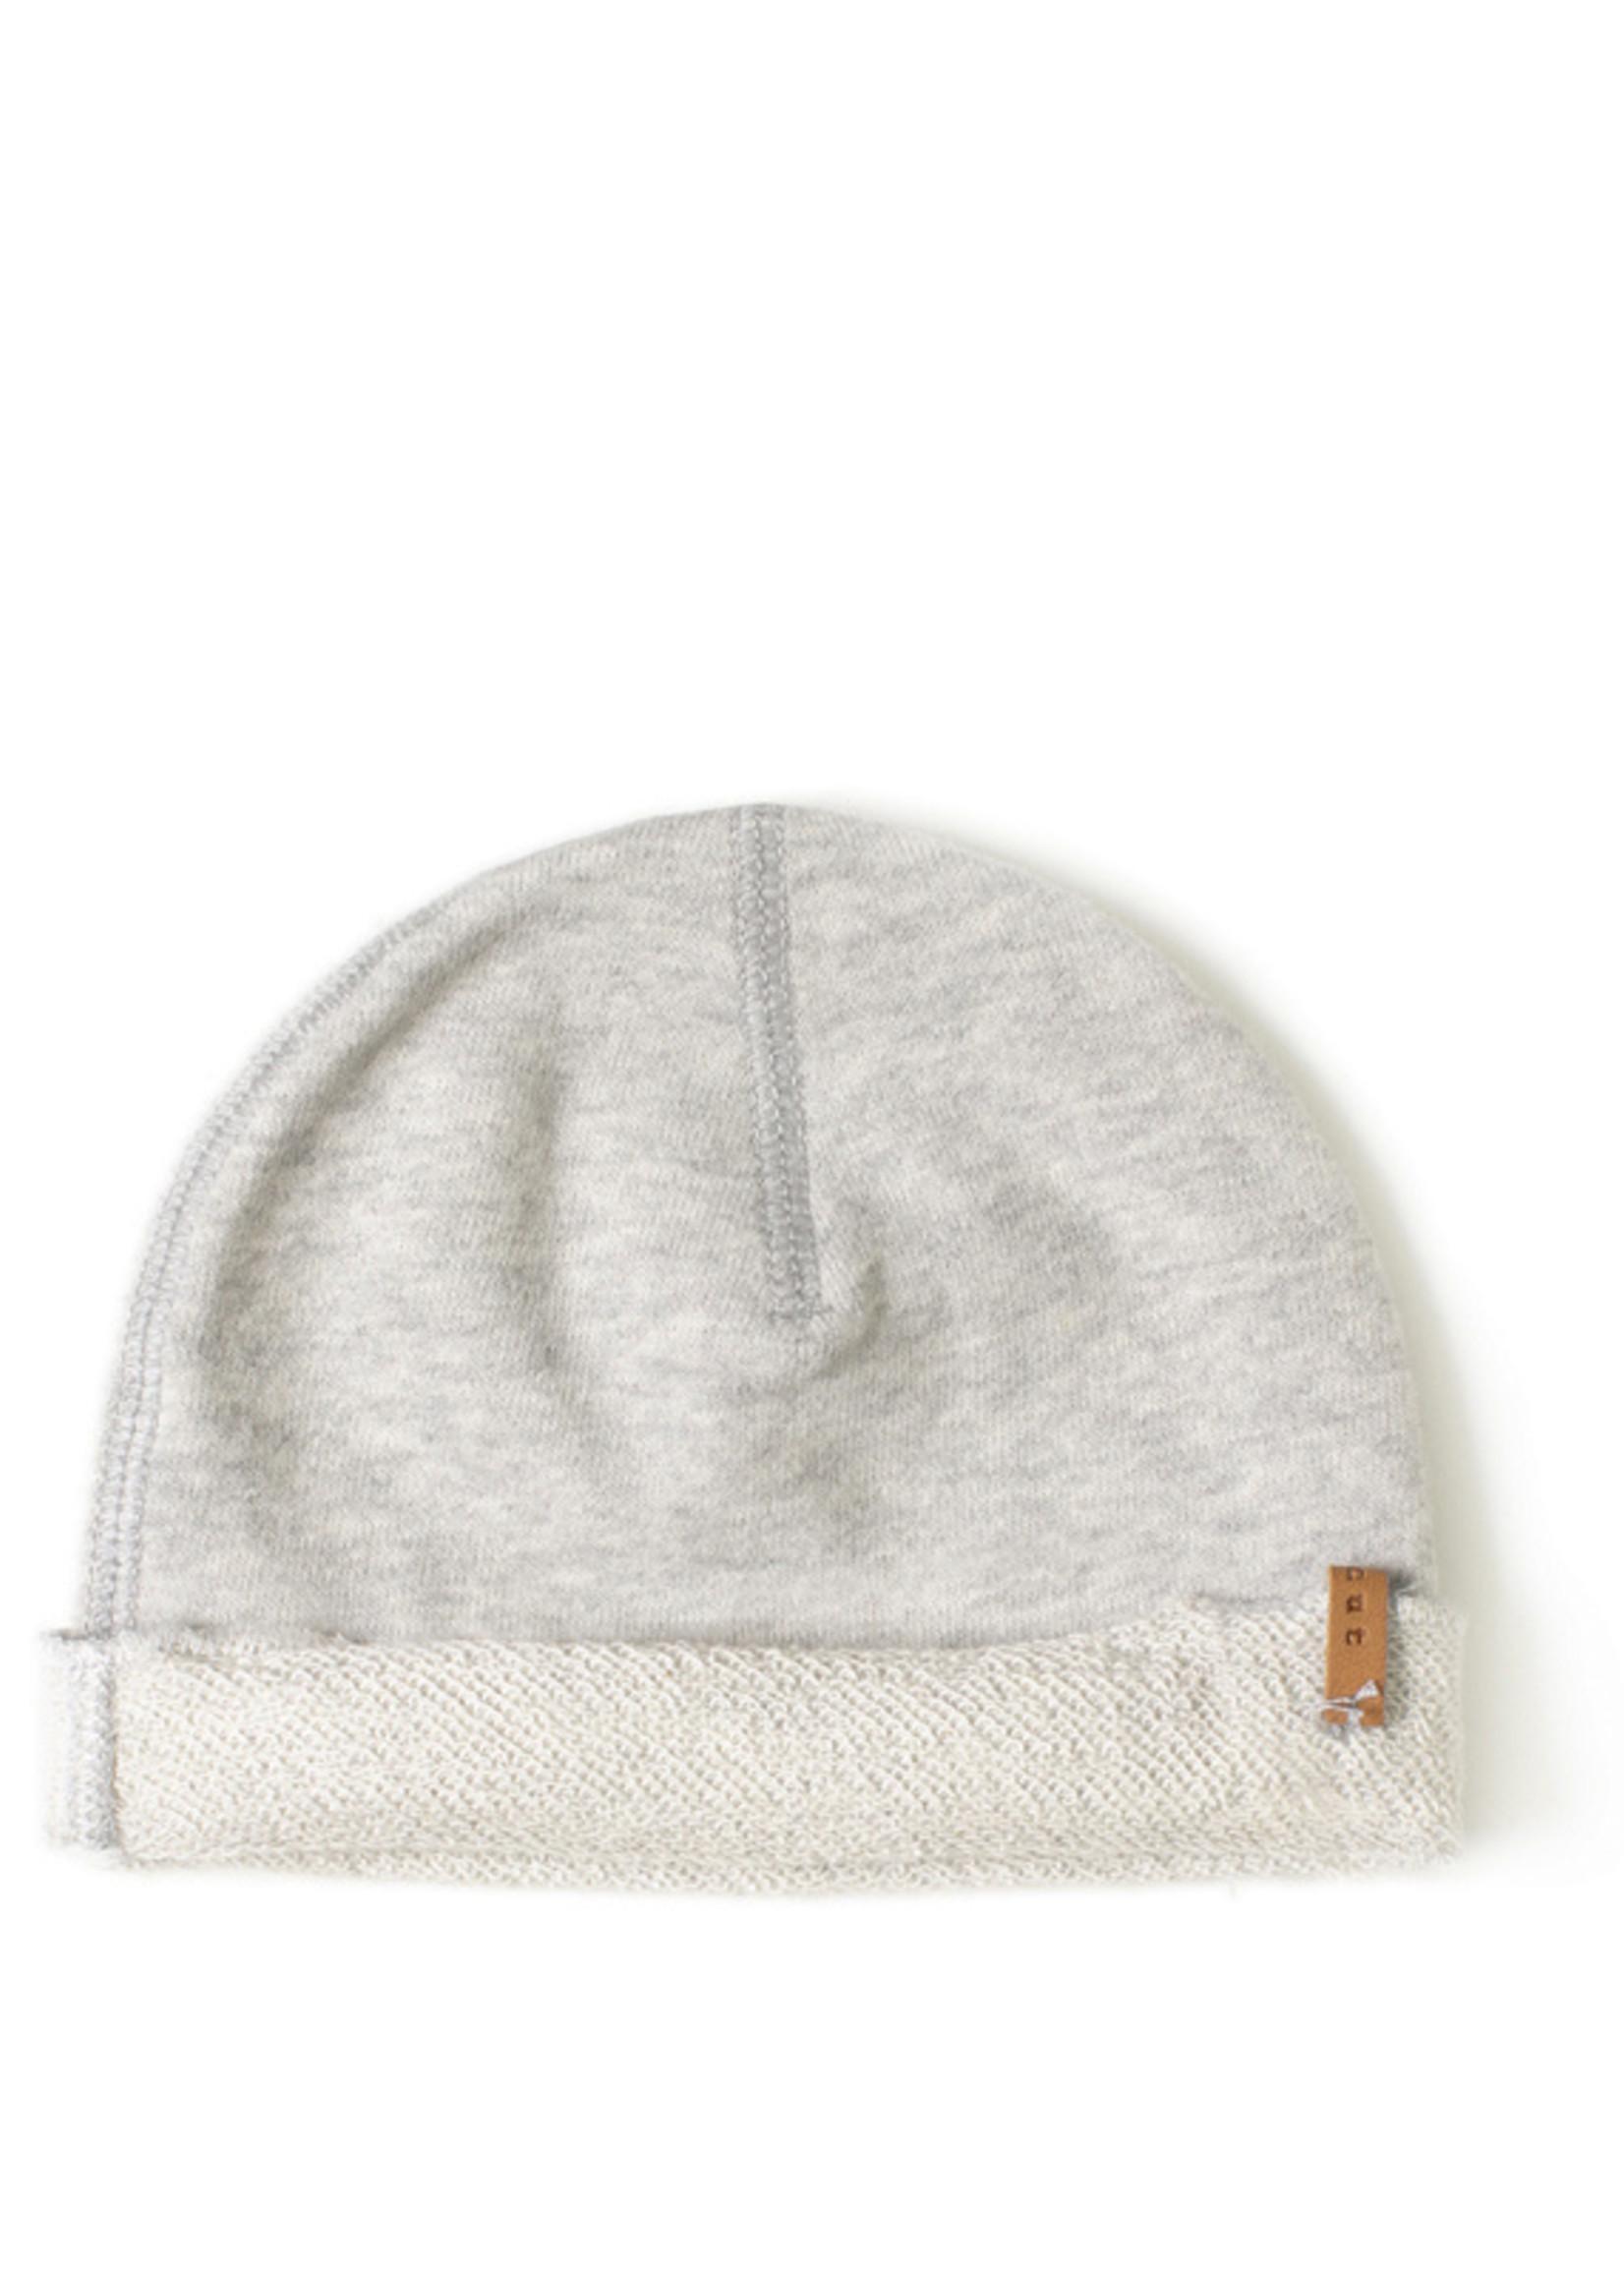 Nixnut Born Hat - Grey